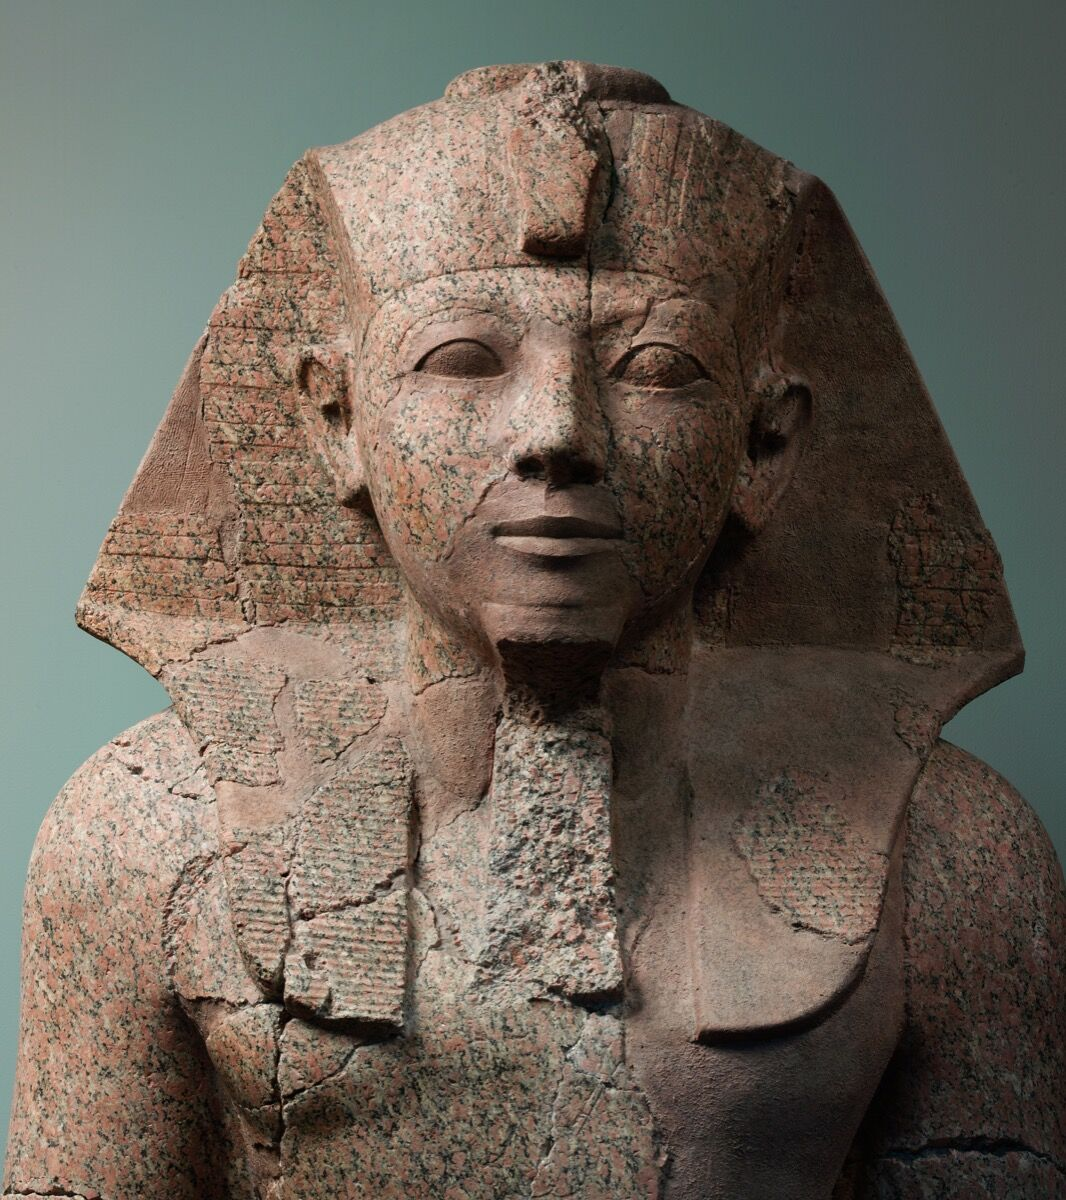 Large Kneeling Statue of Hatshepsut, c. 1479–1458 B.C. Courtesy of the Metropolitan Museum of Art.